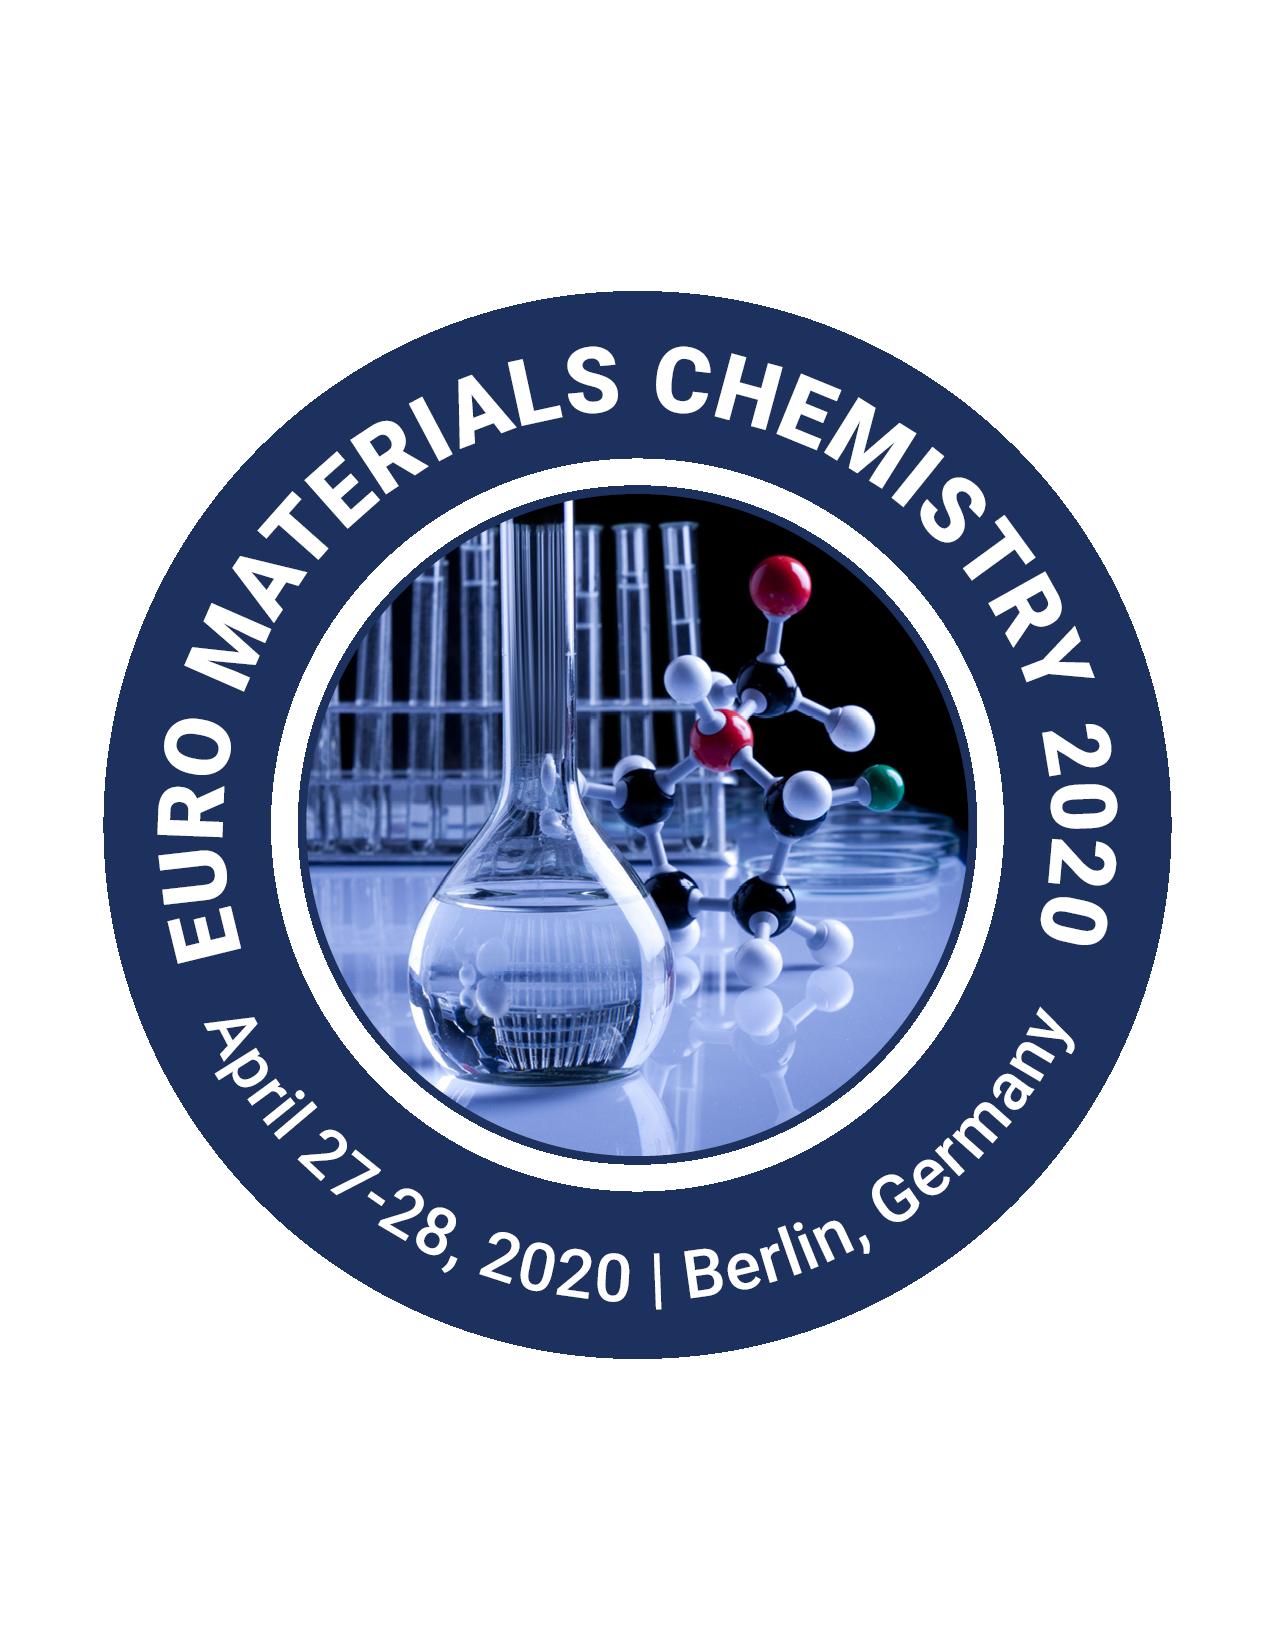 Materials Chemistry Conferences, Berlin, Brandenburg, Germany